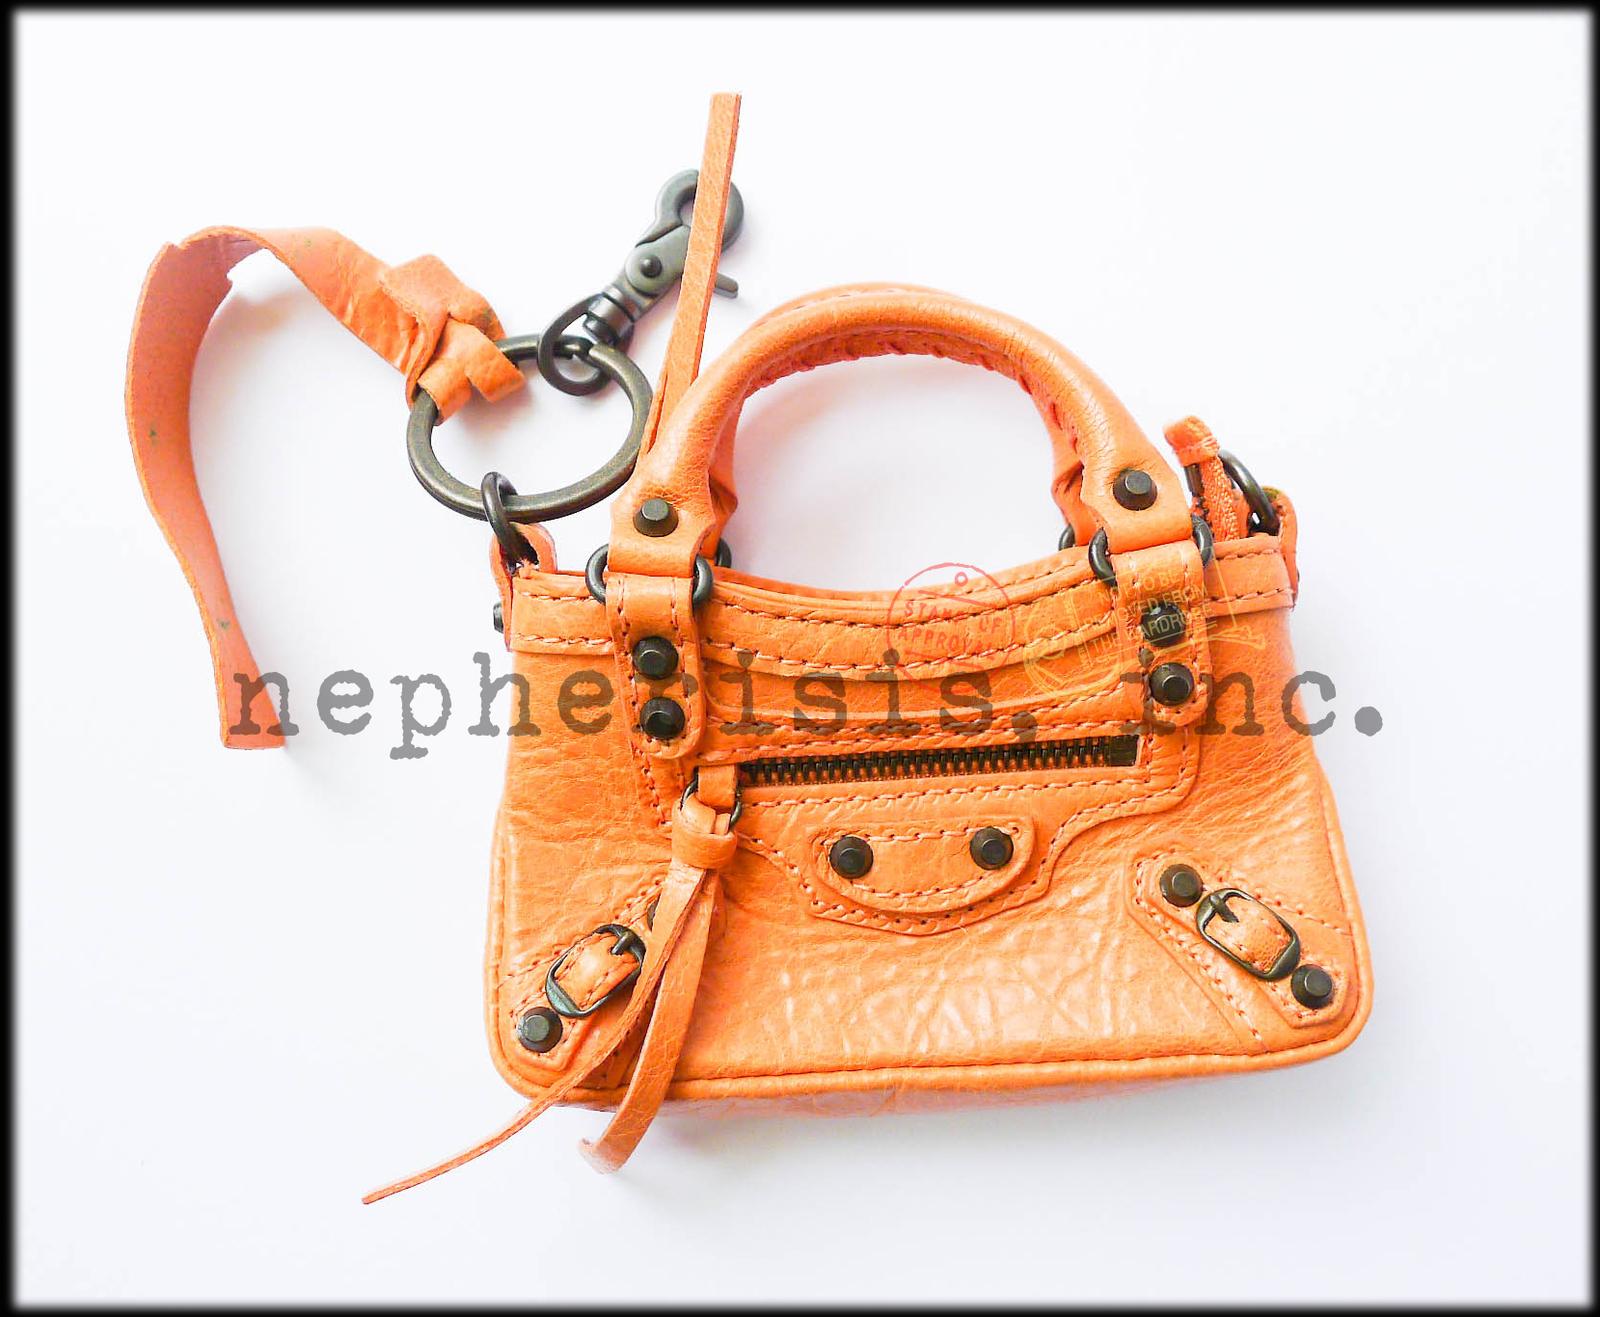 AUTH NEW 2012 Balenciaga MINI MINI FIRST MMF Keychain or Bag Charm ROSE BLUSH image 6